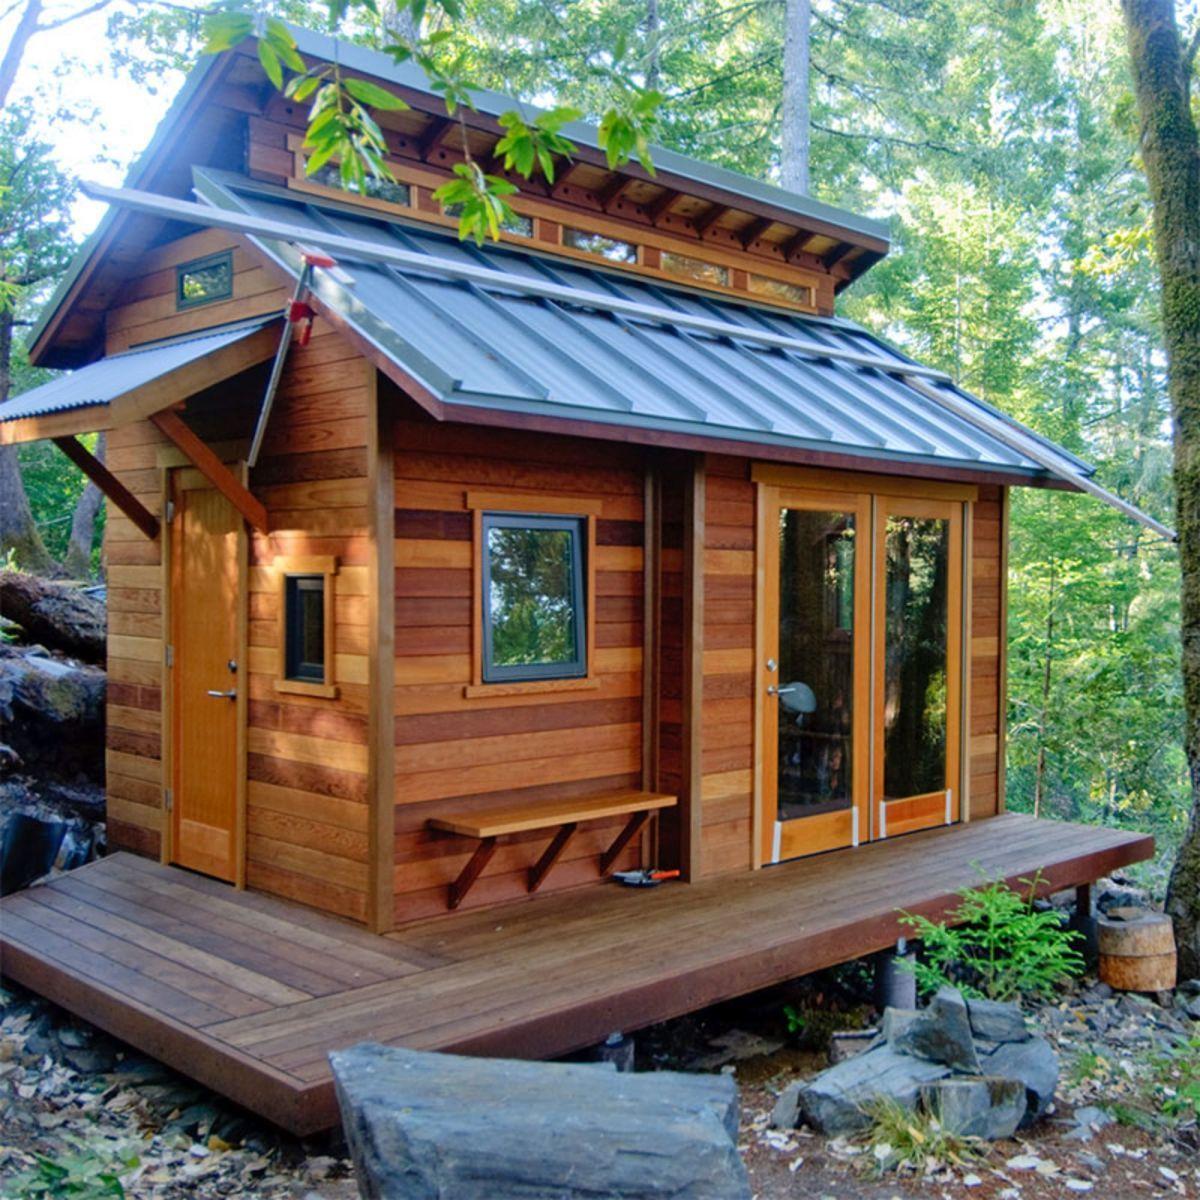 Magic Tiny Houses Where Life Becomes Simple Tiny House